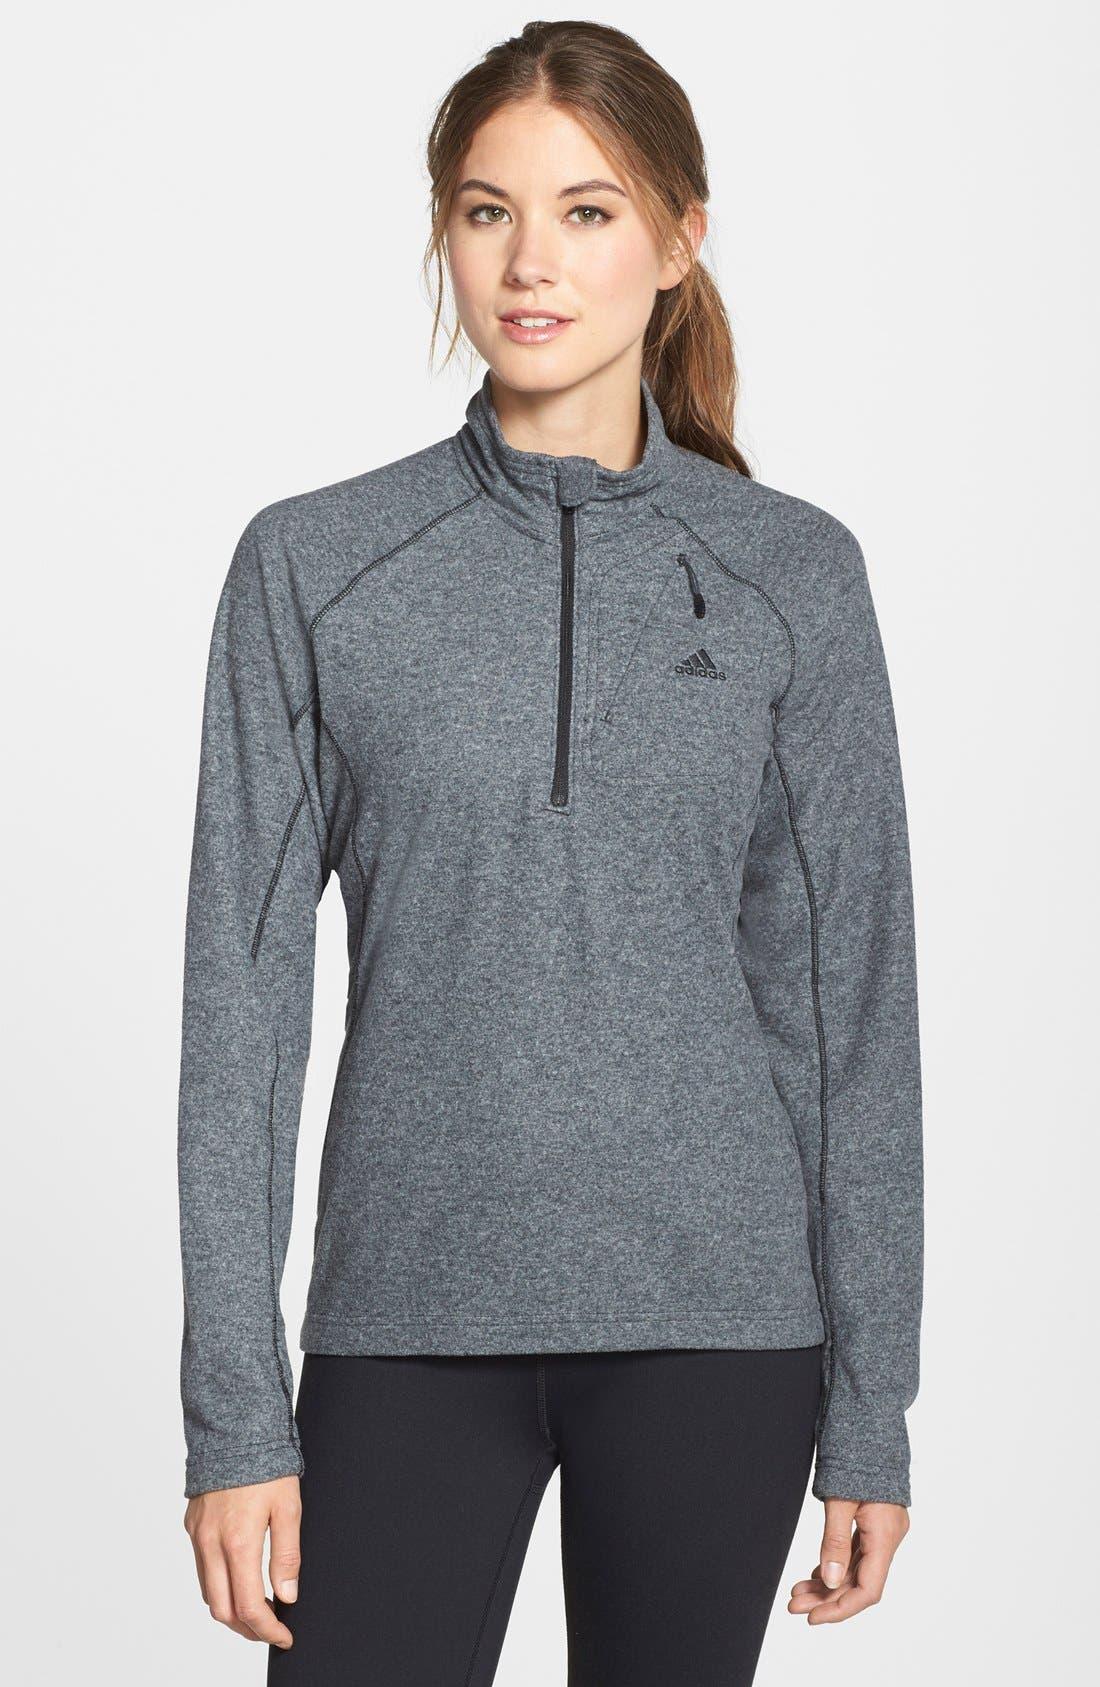 adidas 'Reachout' Half Zip Hiking Top